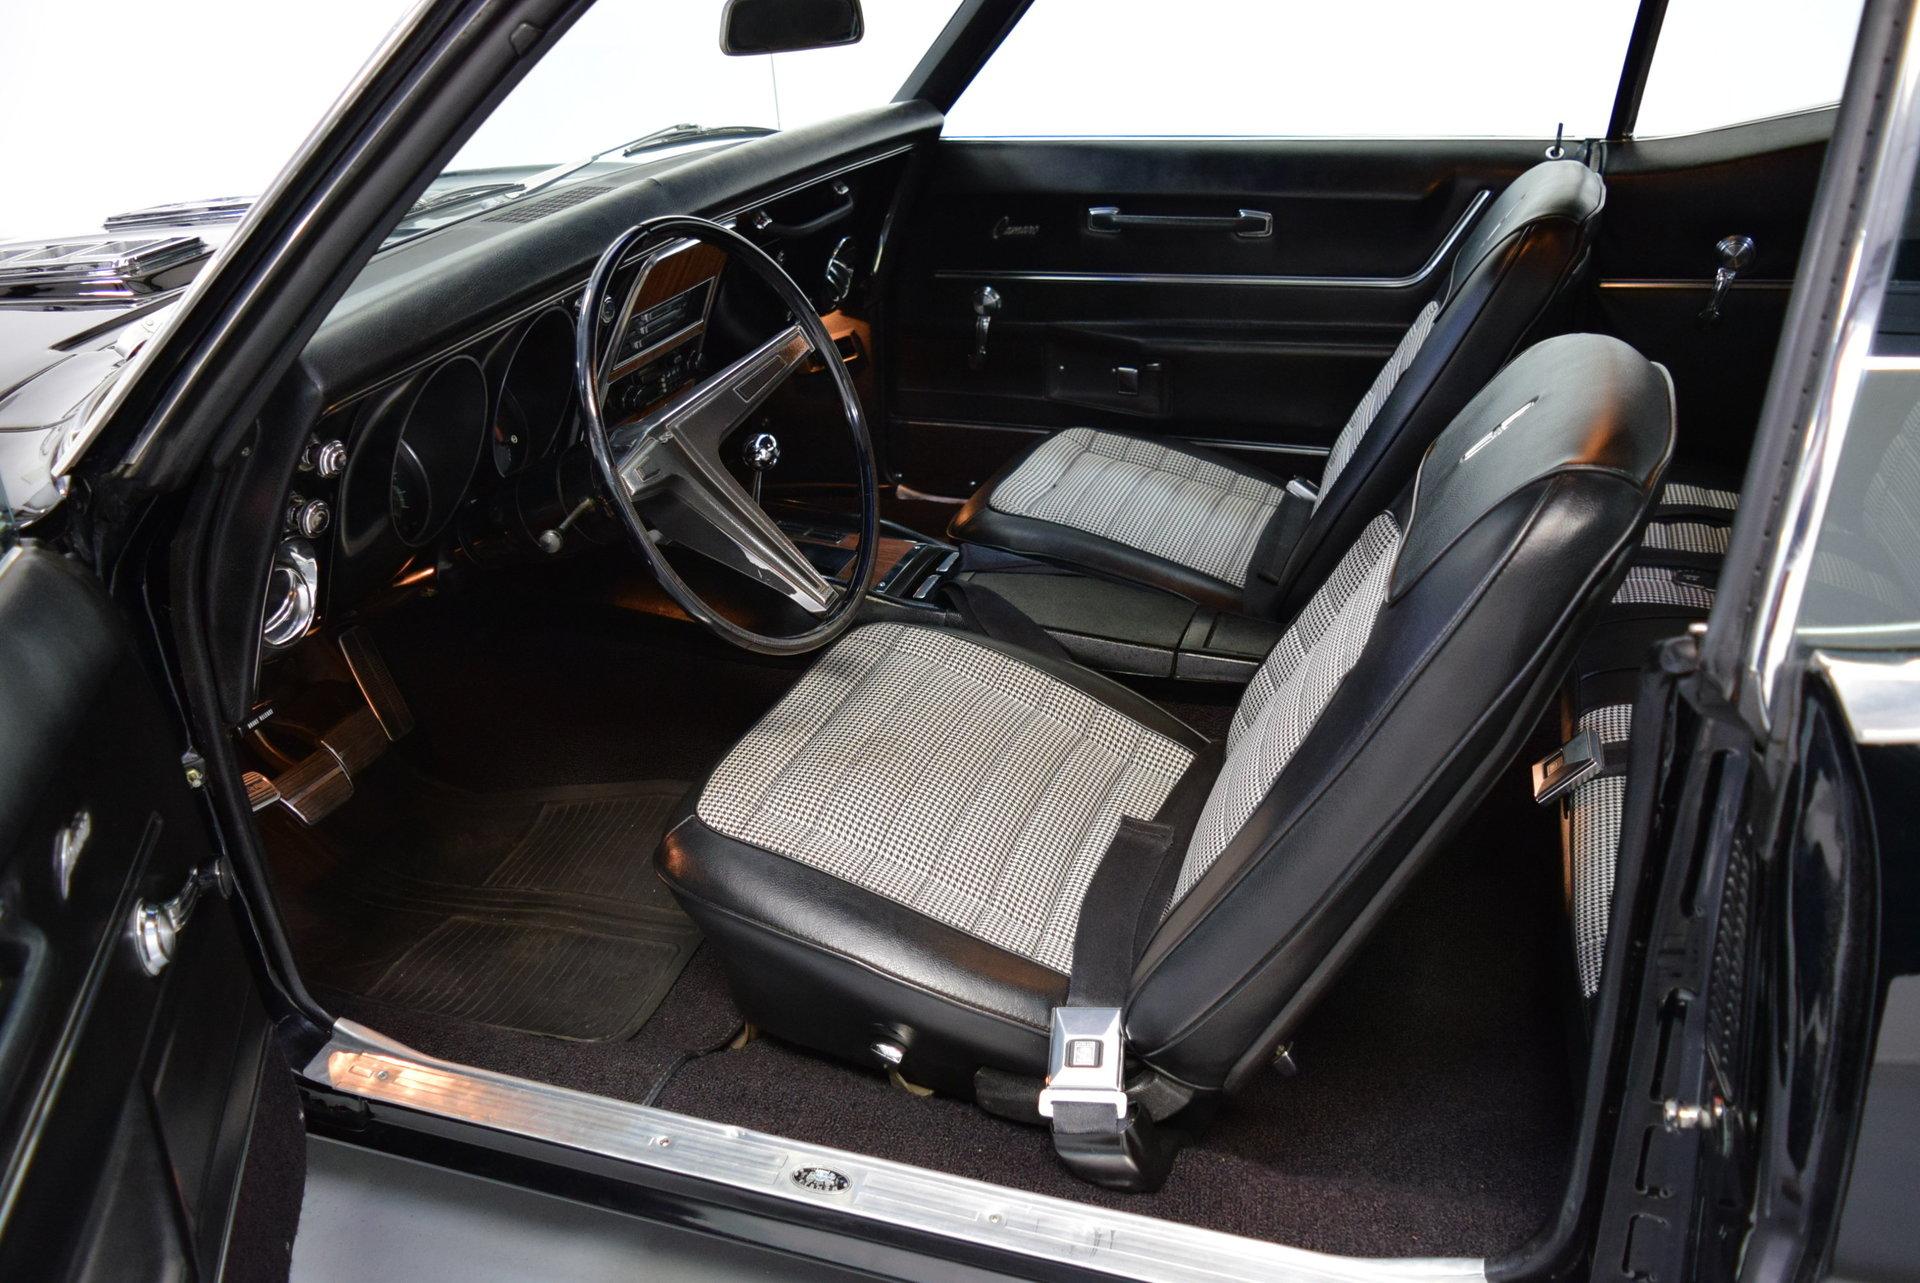 1968 Chevrolet Camaro Shelton Classics Performance Chevy Rs Ss